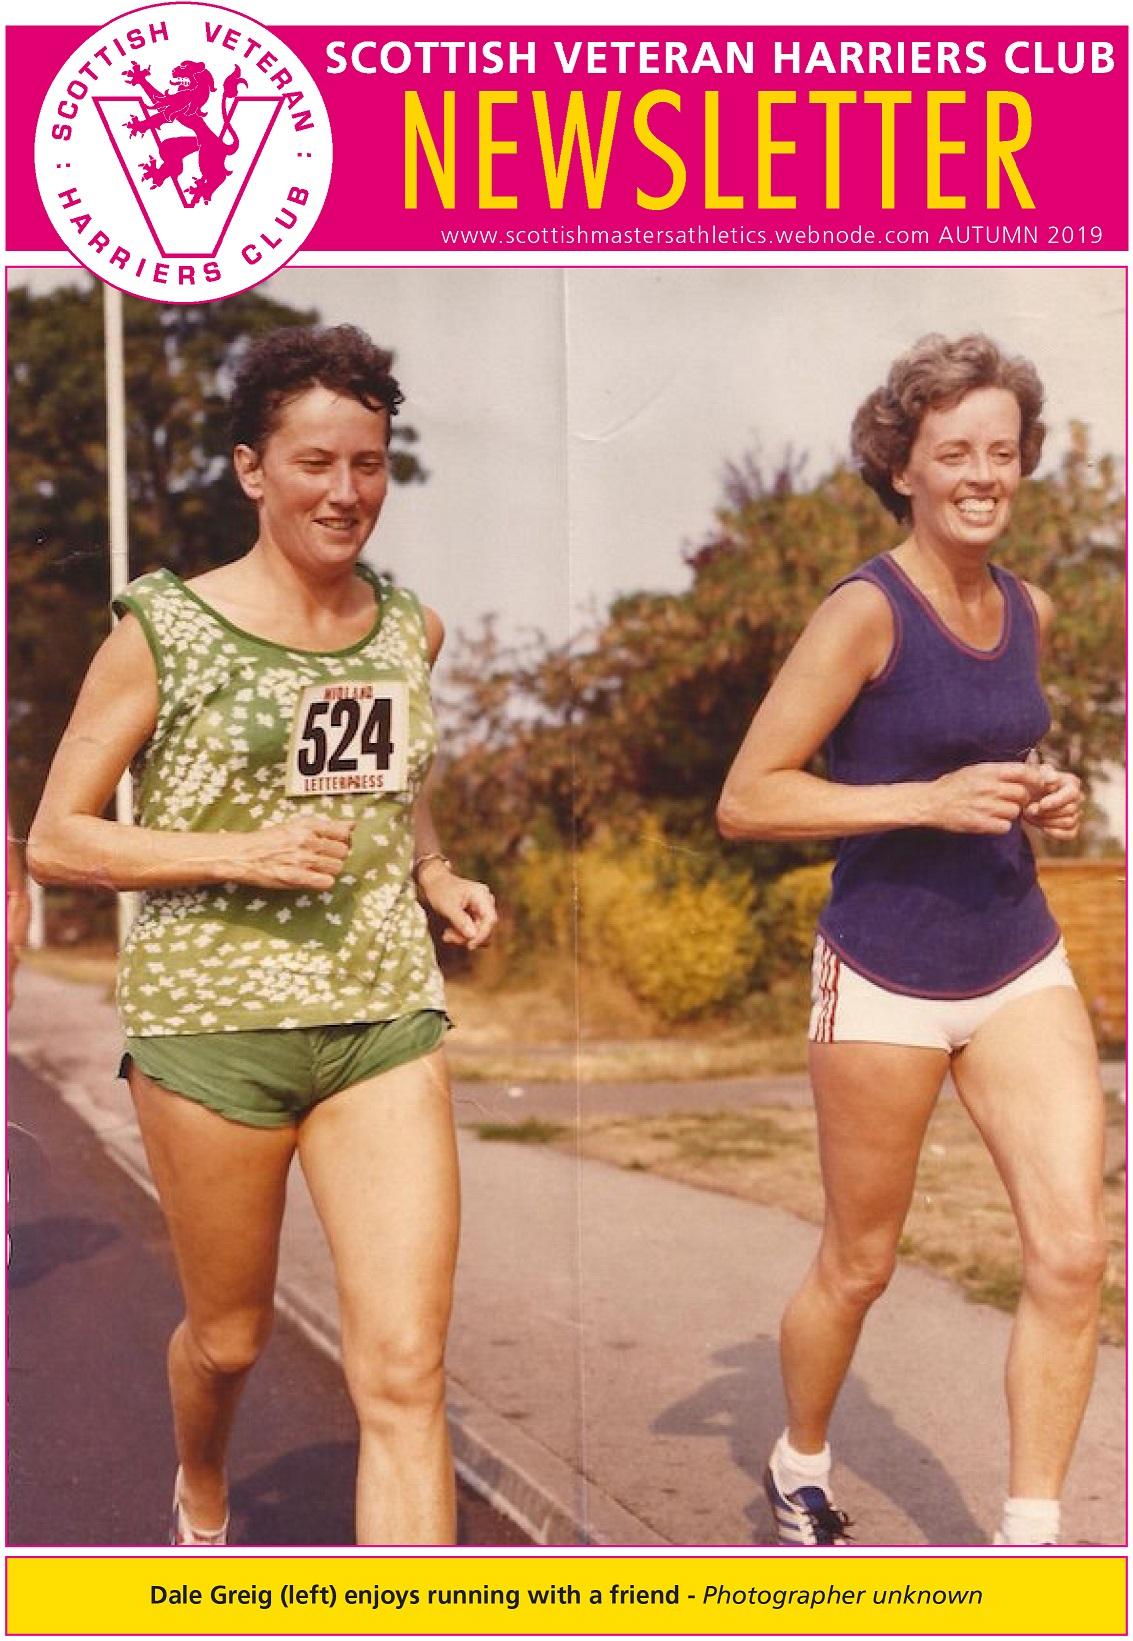 Womens American Half Scotland Flag Thigh High Socks For Athletic,Running,Travel,Nurses,Fitness